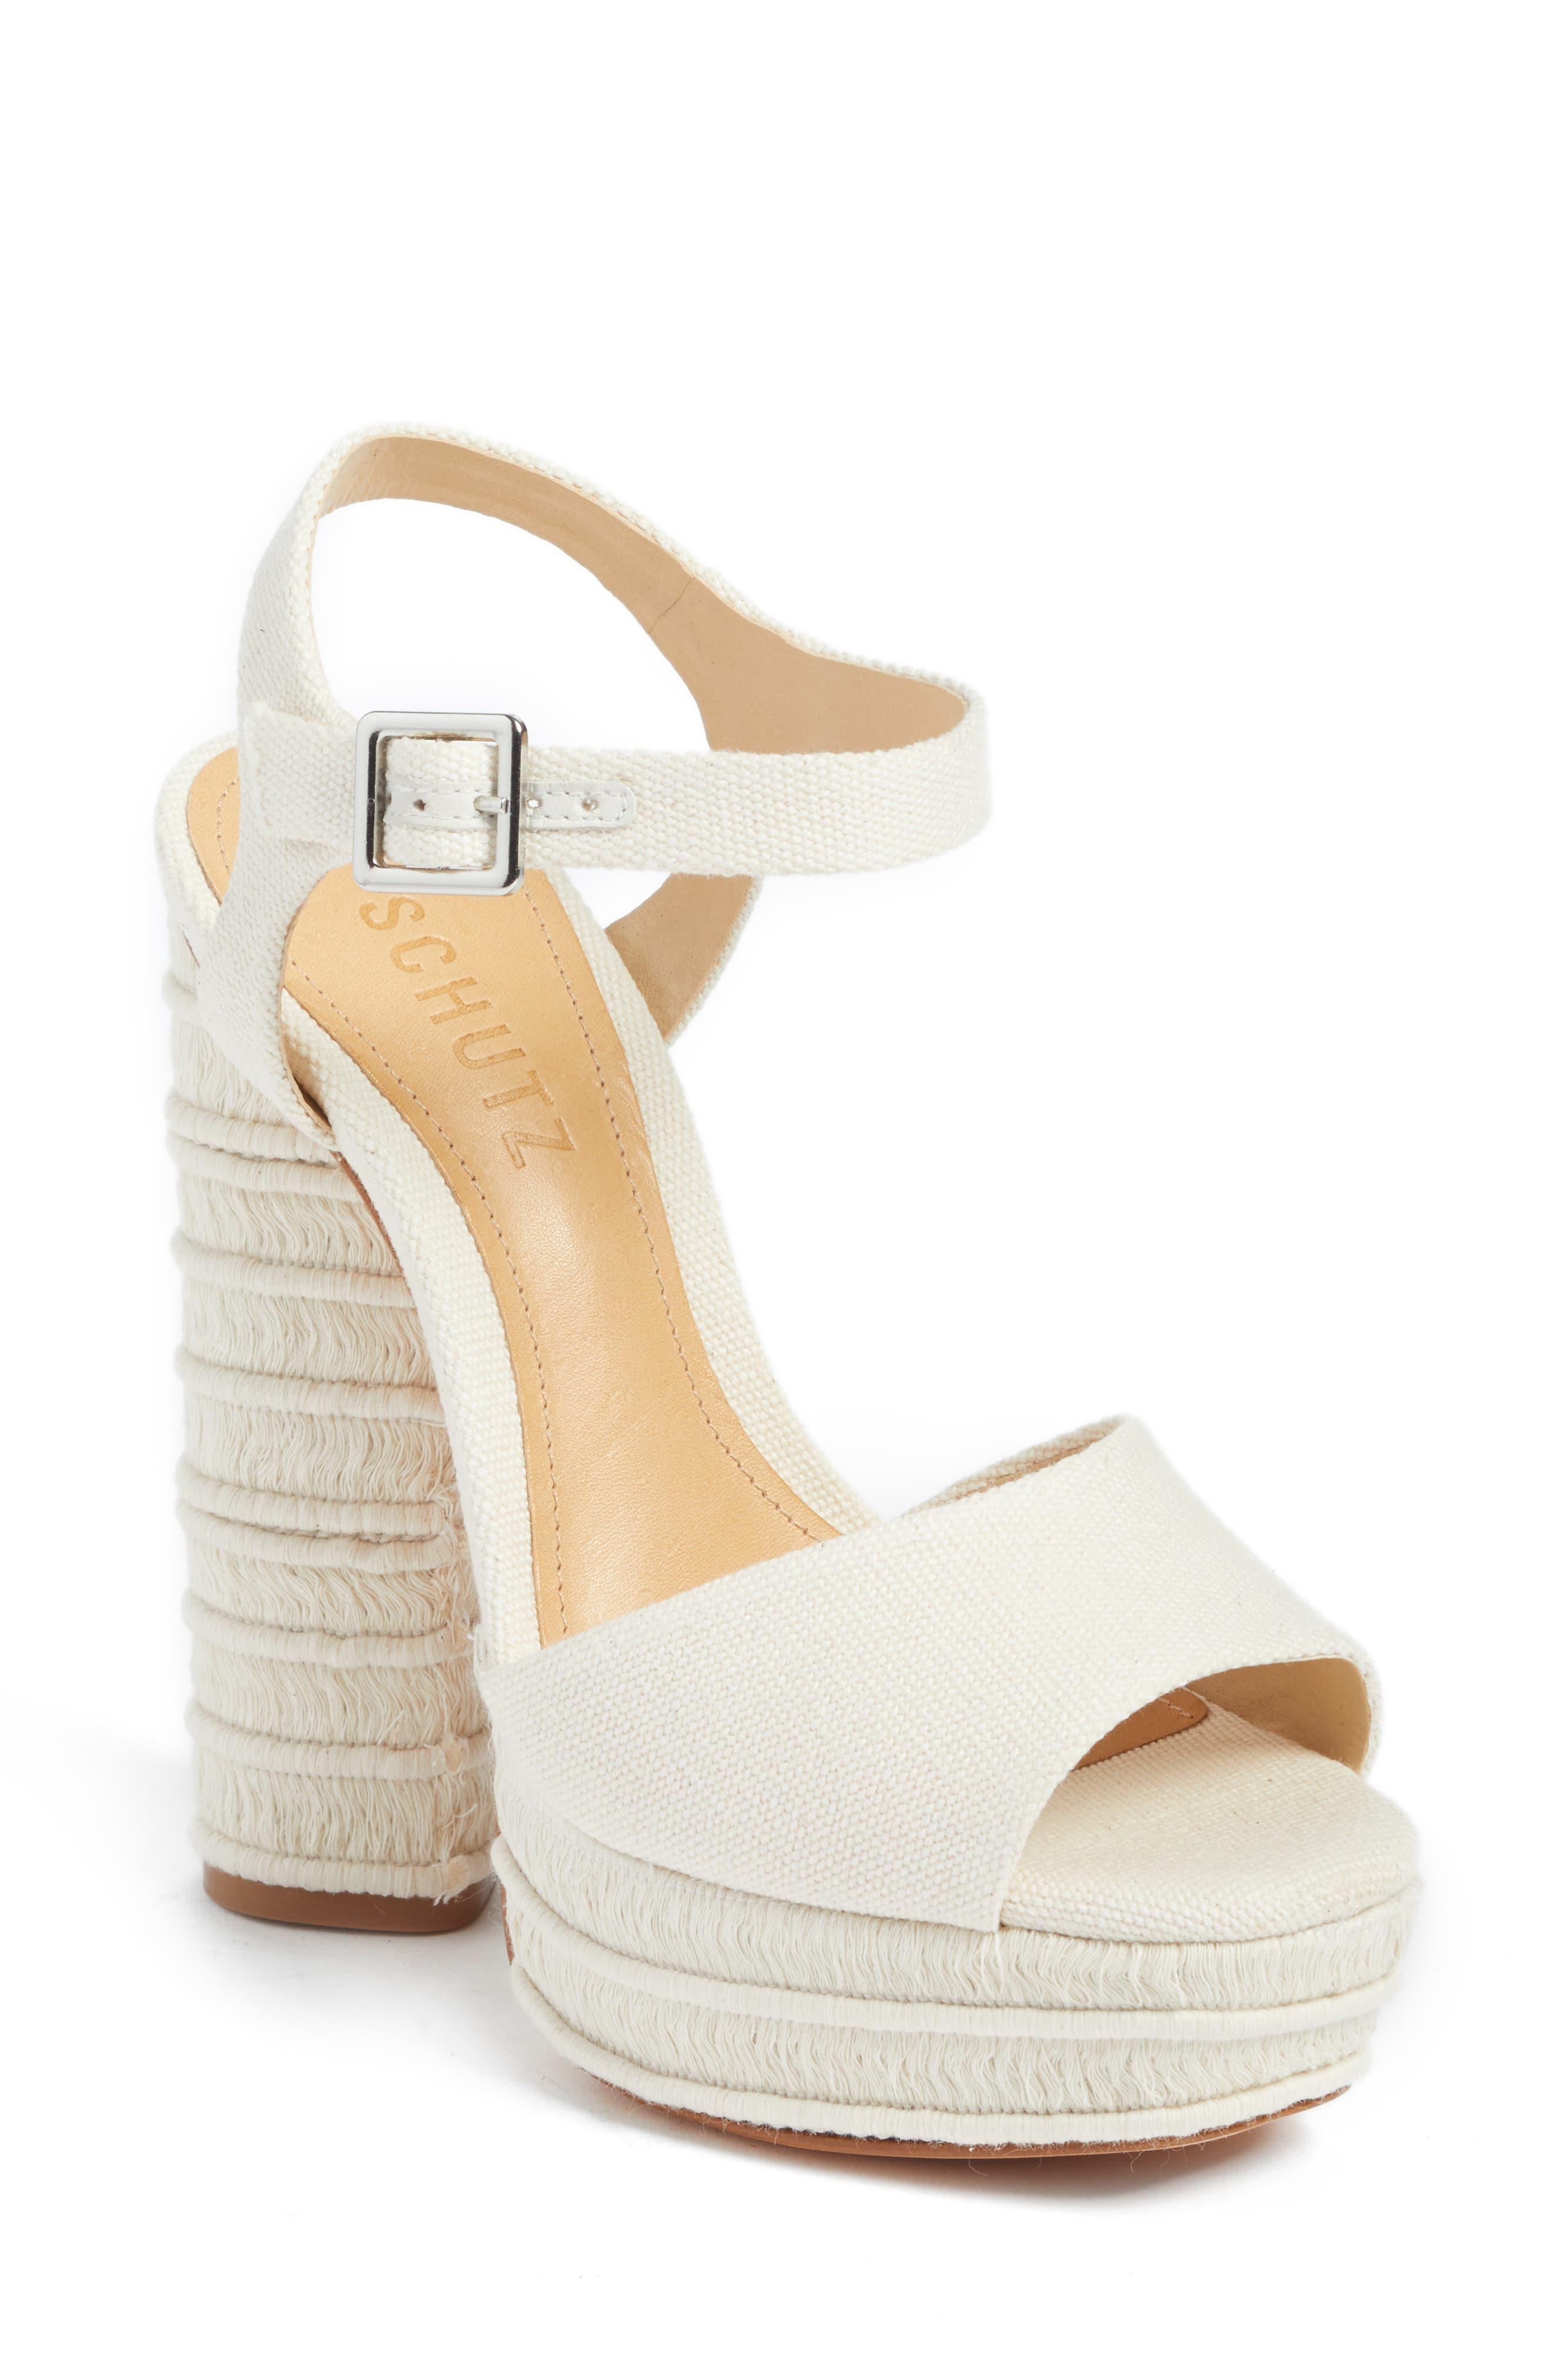 To Buy Women b.o.c Langley Wedge Sandal Nude - K6T7543190